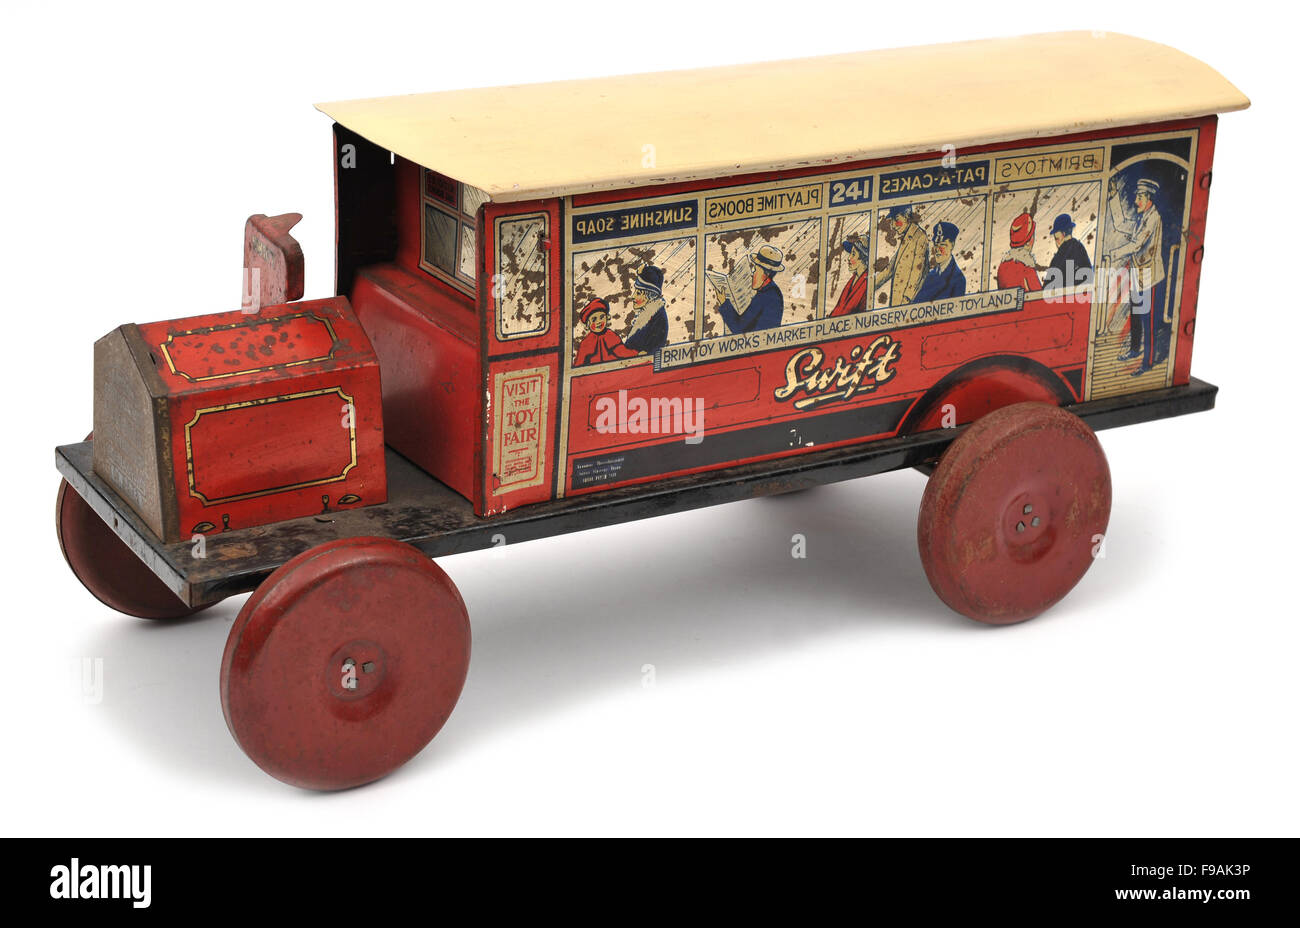 Children's Brimtoy (Mettoy) tinplate bus toy - Stock Image